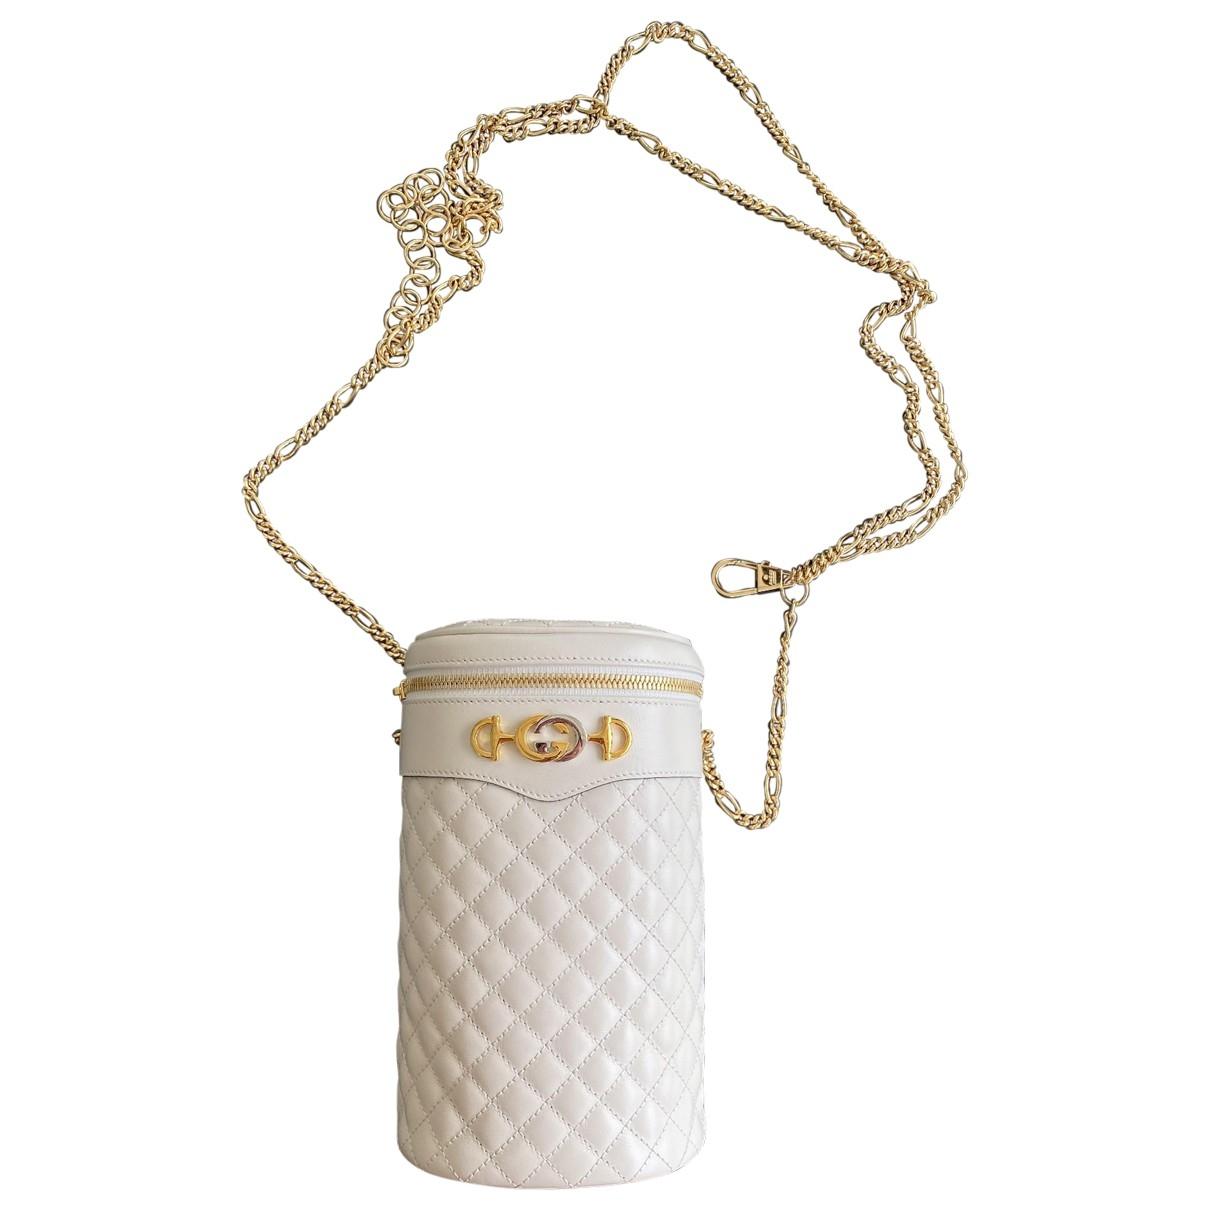 Gucci \N White Leather handbag for Women \N